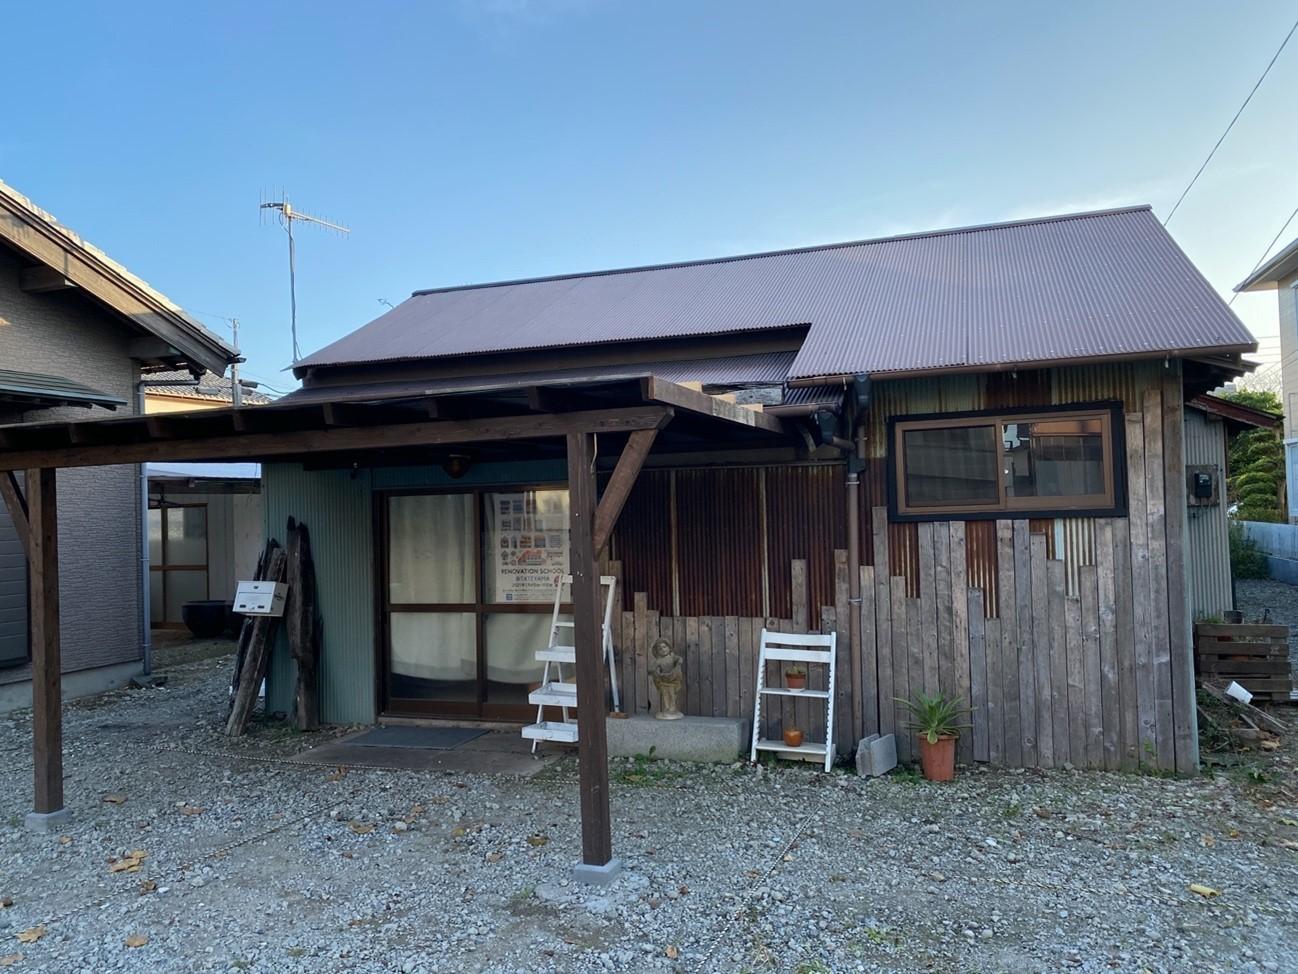 tu.ne.Hostelの横の敷地にある元飲食店。立ち食い蕎麦屋の開業に向け、DIY工事が進んでいた